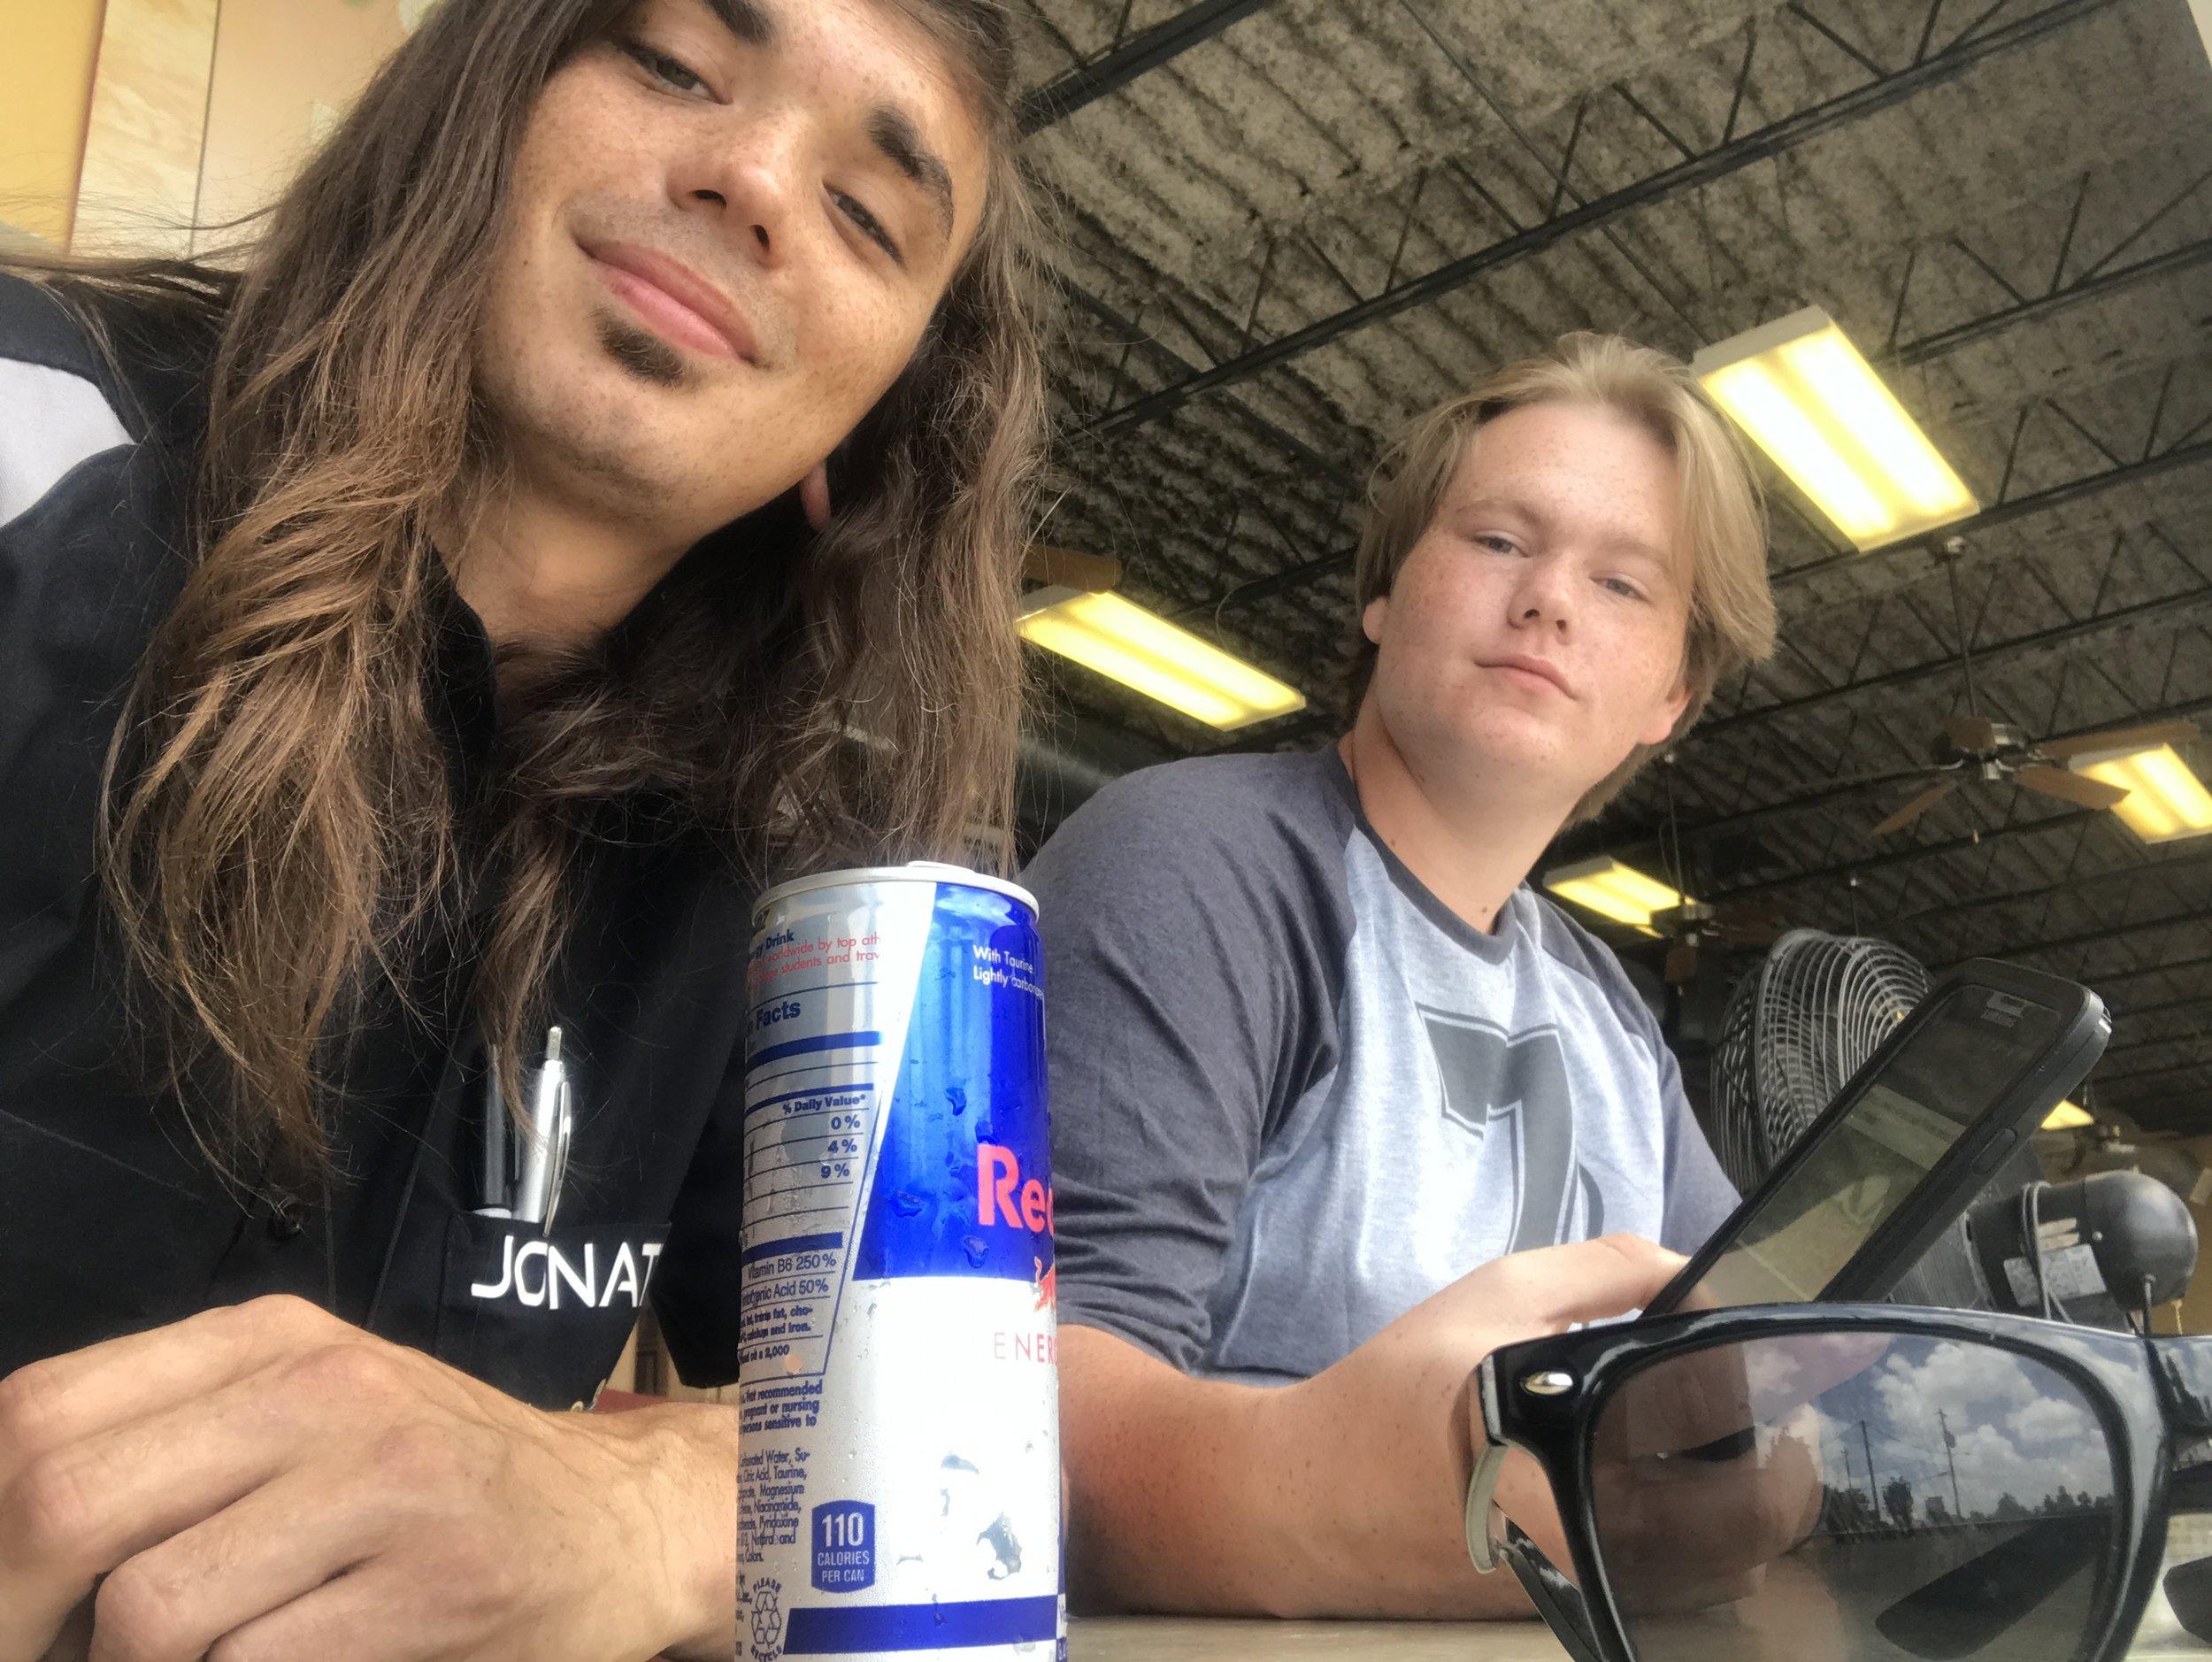 Jonathan & Remington at lunch! #revairtx #htowntechs